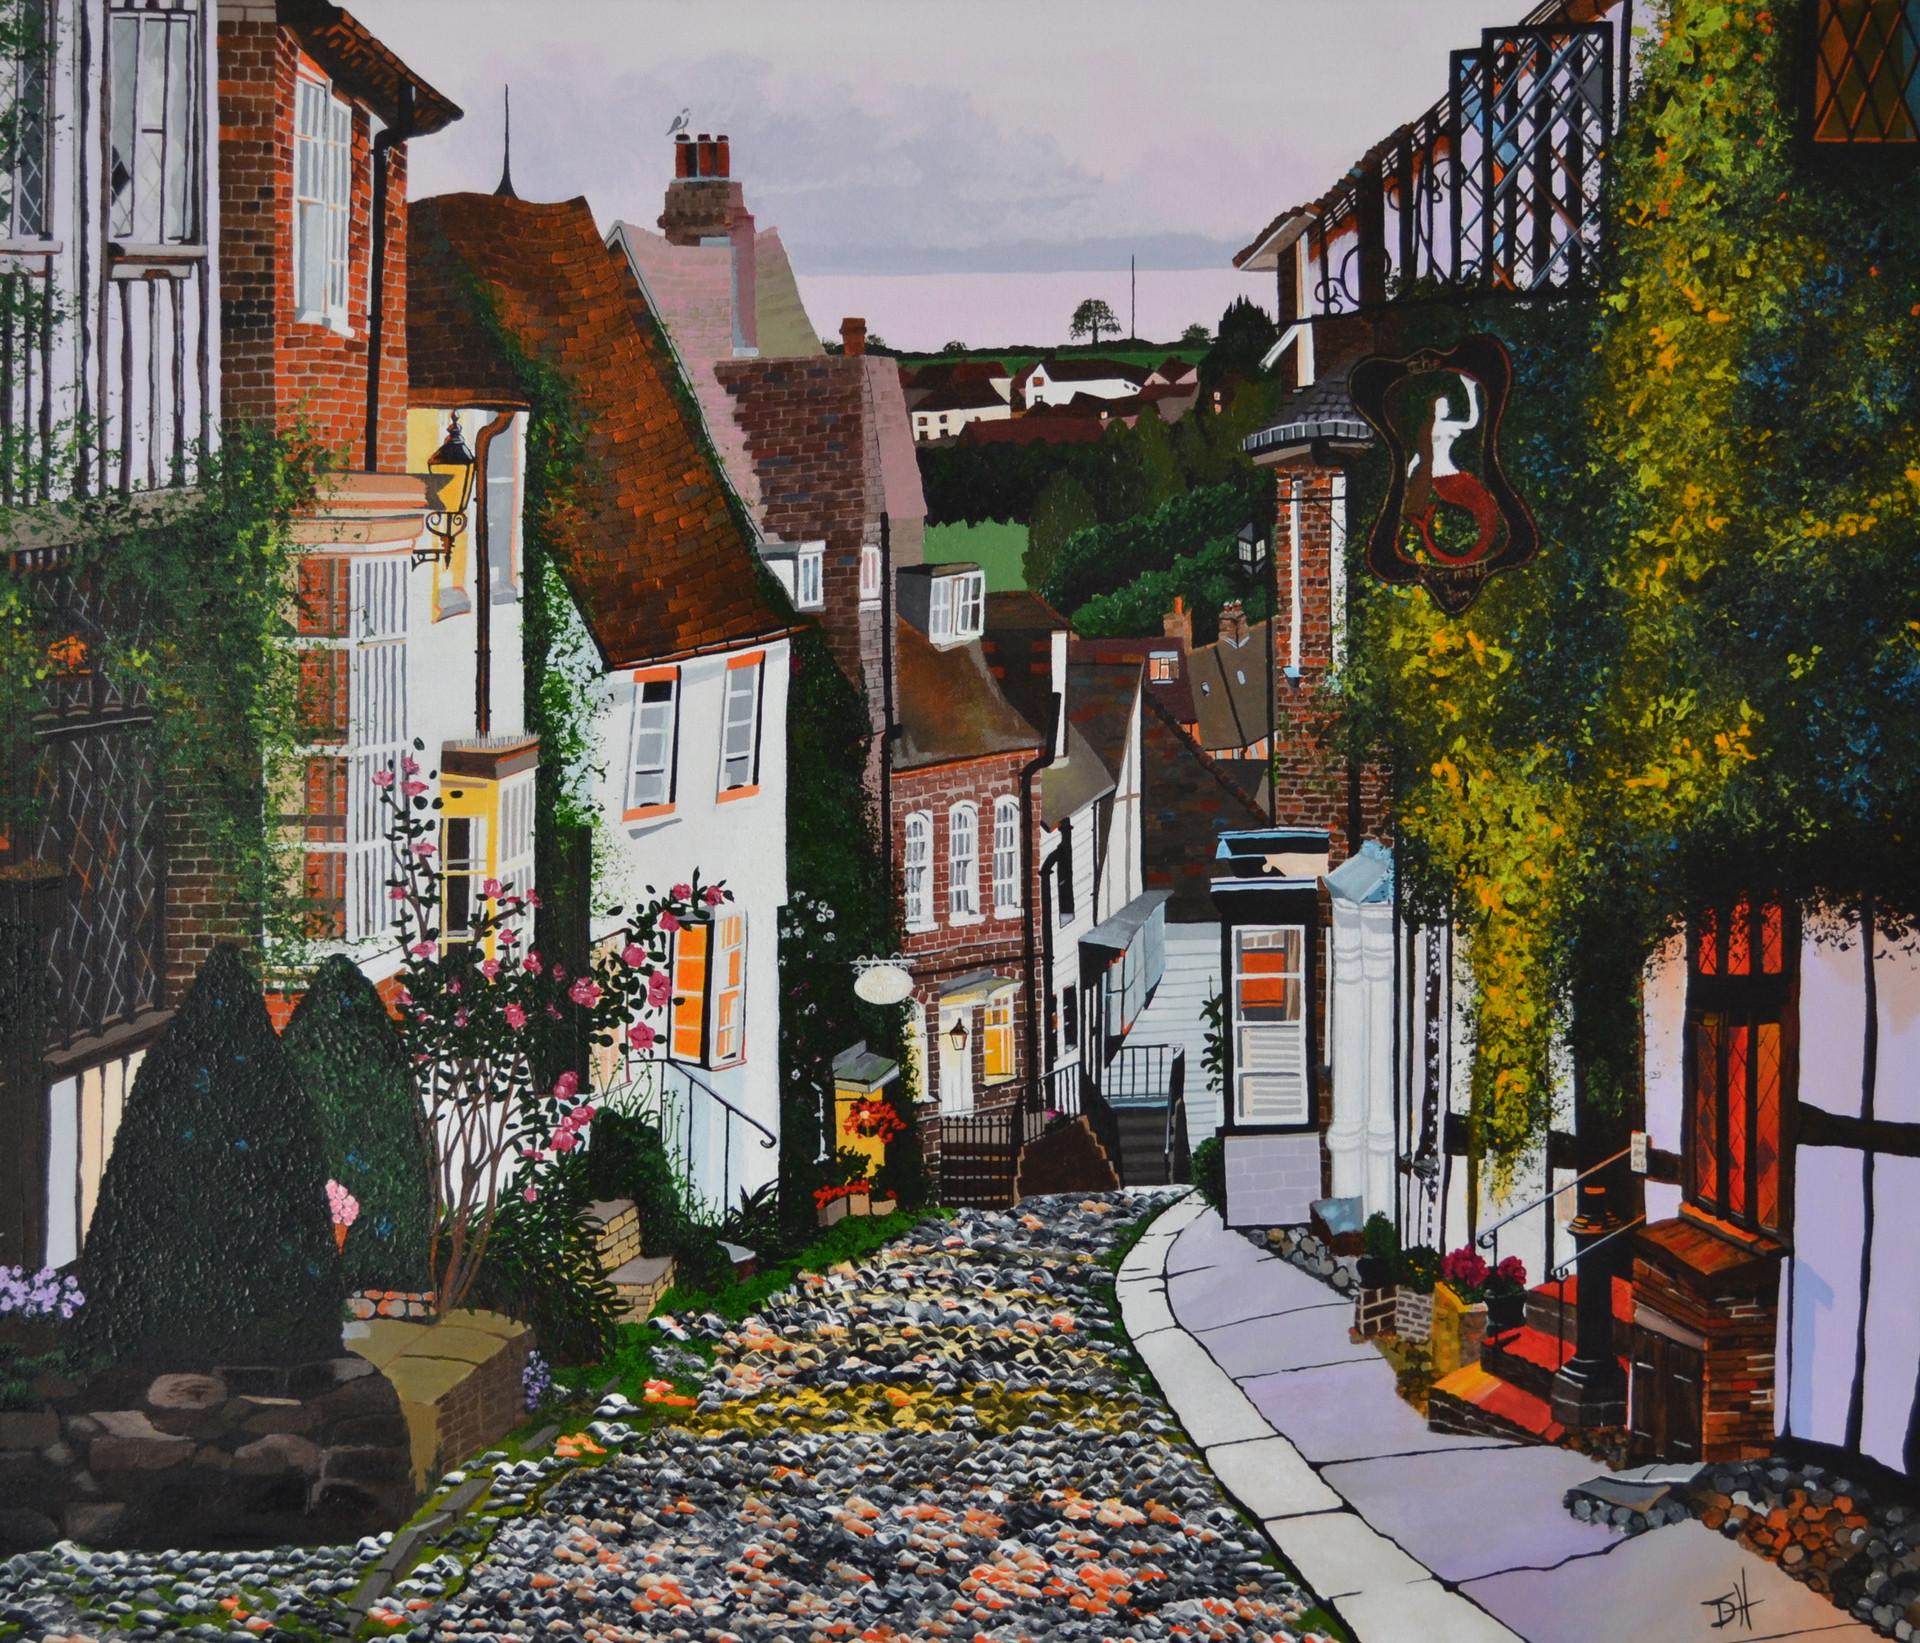 "Mermaid Street, Rye, Kent (W28"" x H24"") Prints available"